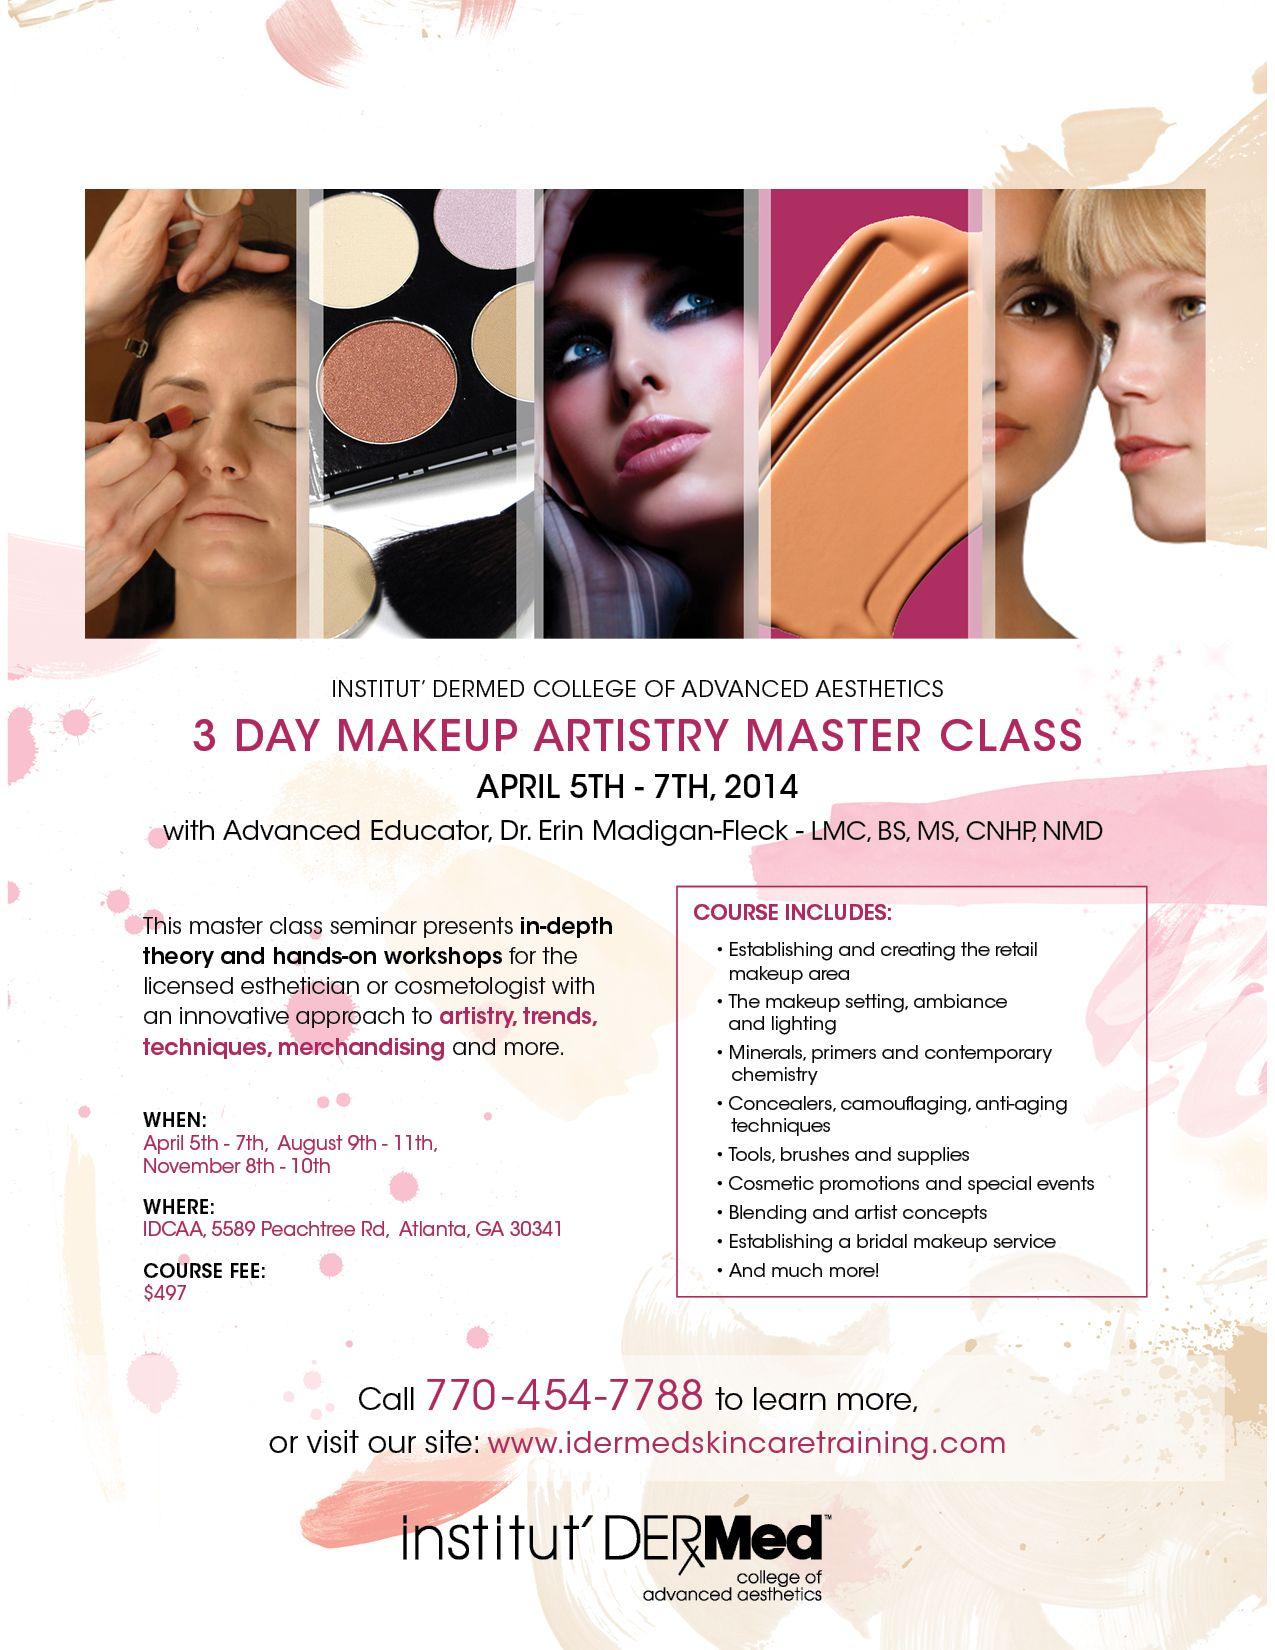 3 Day Makeup Artistry Master Class Day Makeup Advanced Aesthetics Esthetician